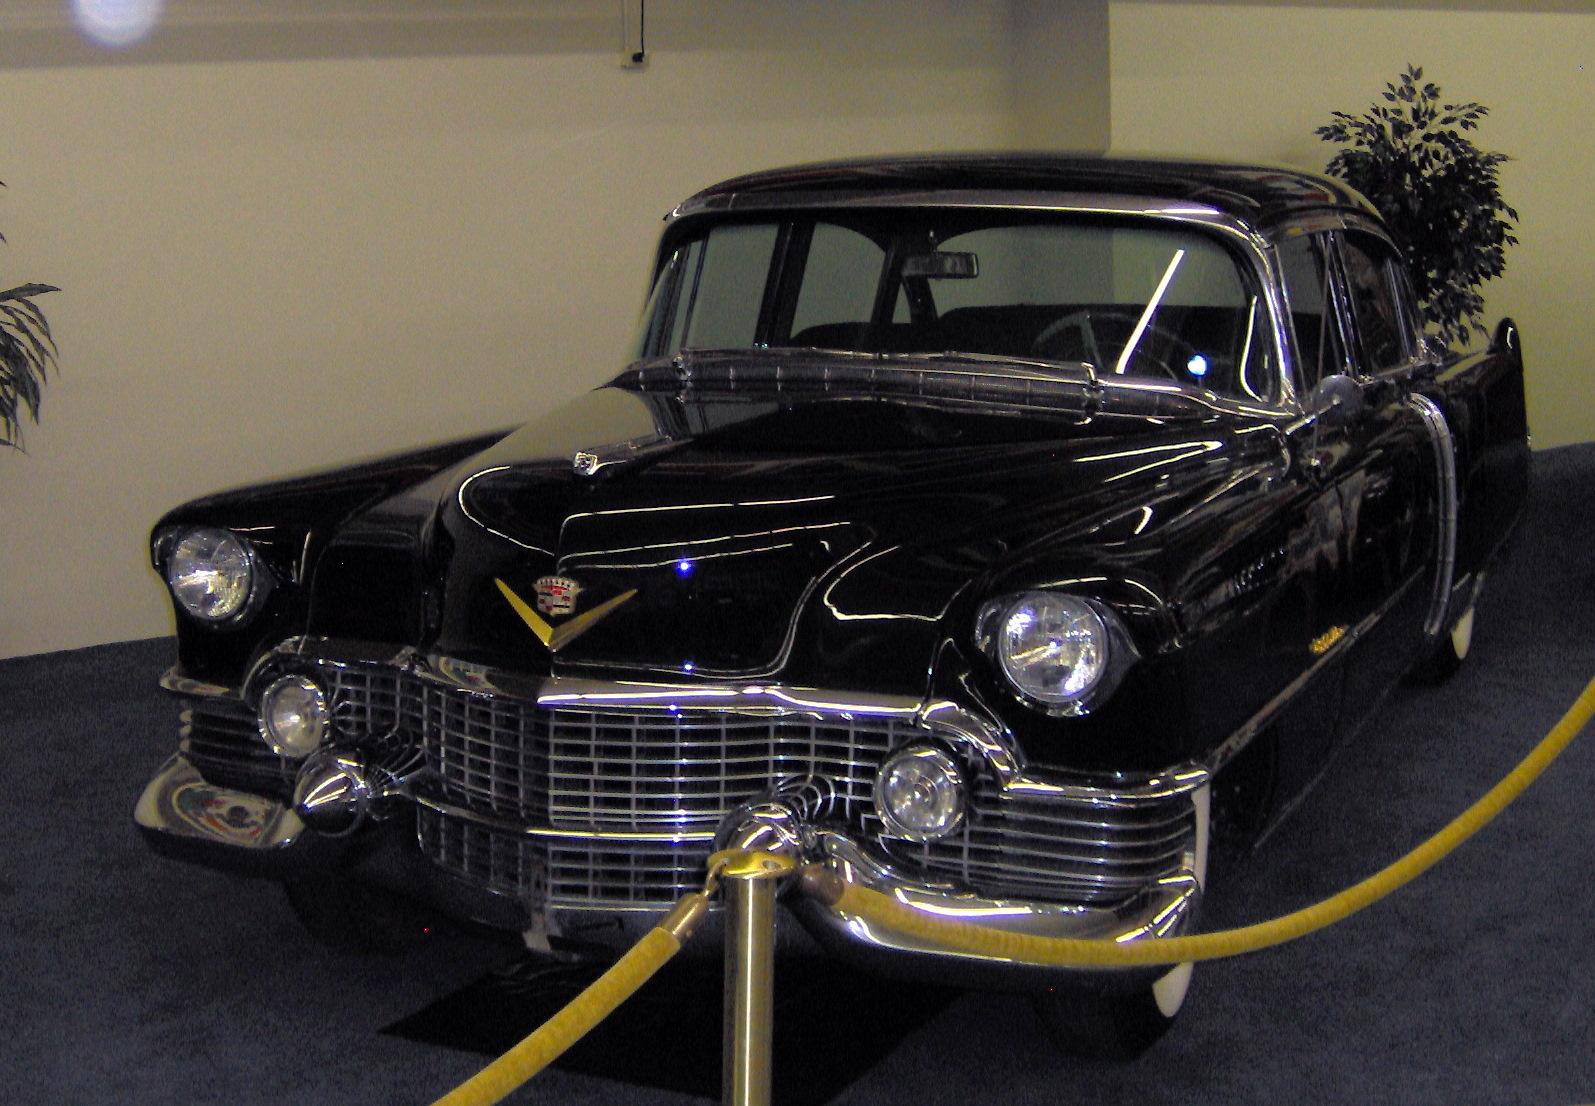 Cadillac Fleetwood Tractor Construction Plant Wiki Fandom 1954 Sedan Deville